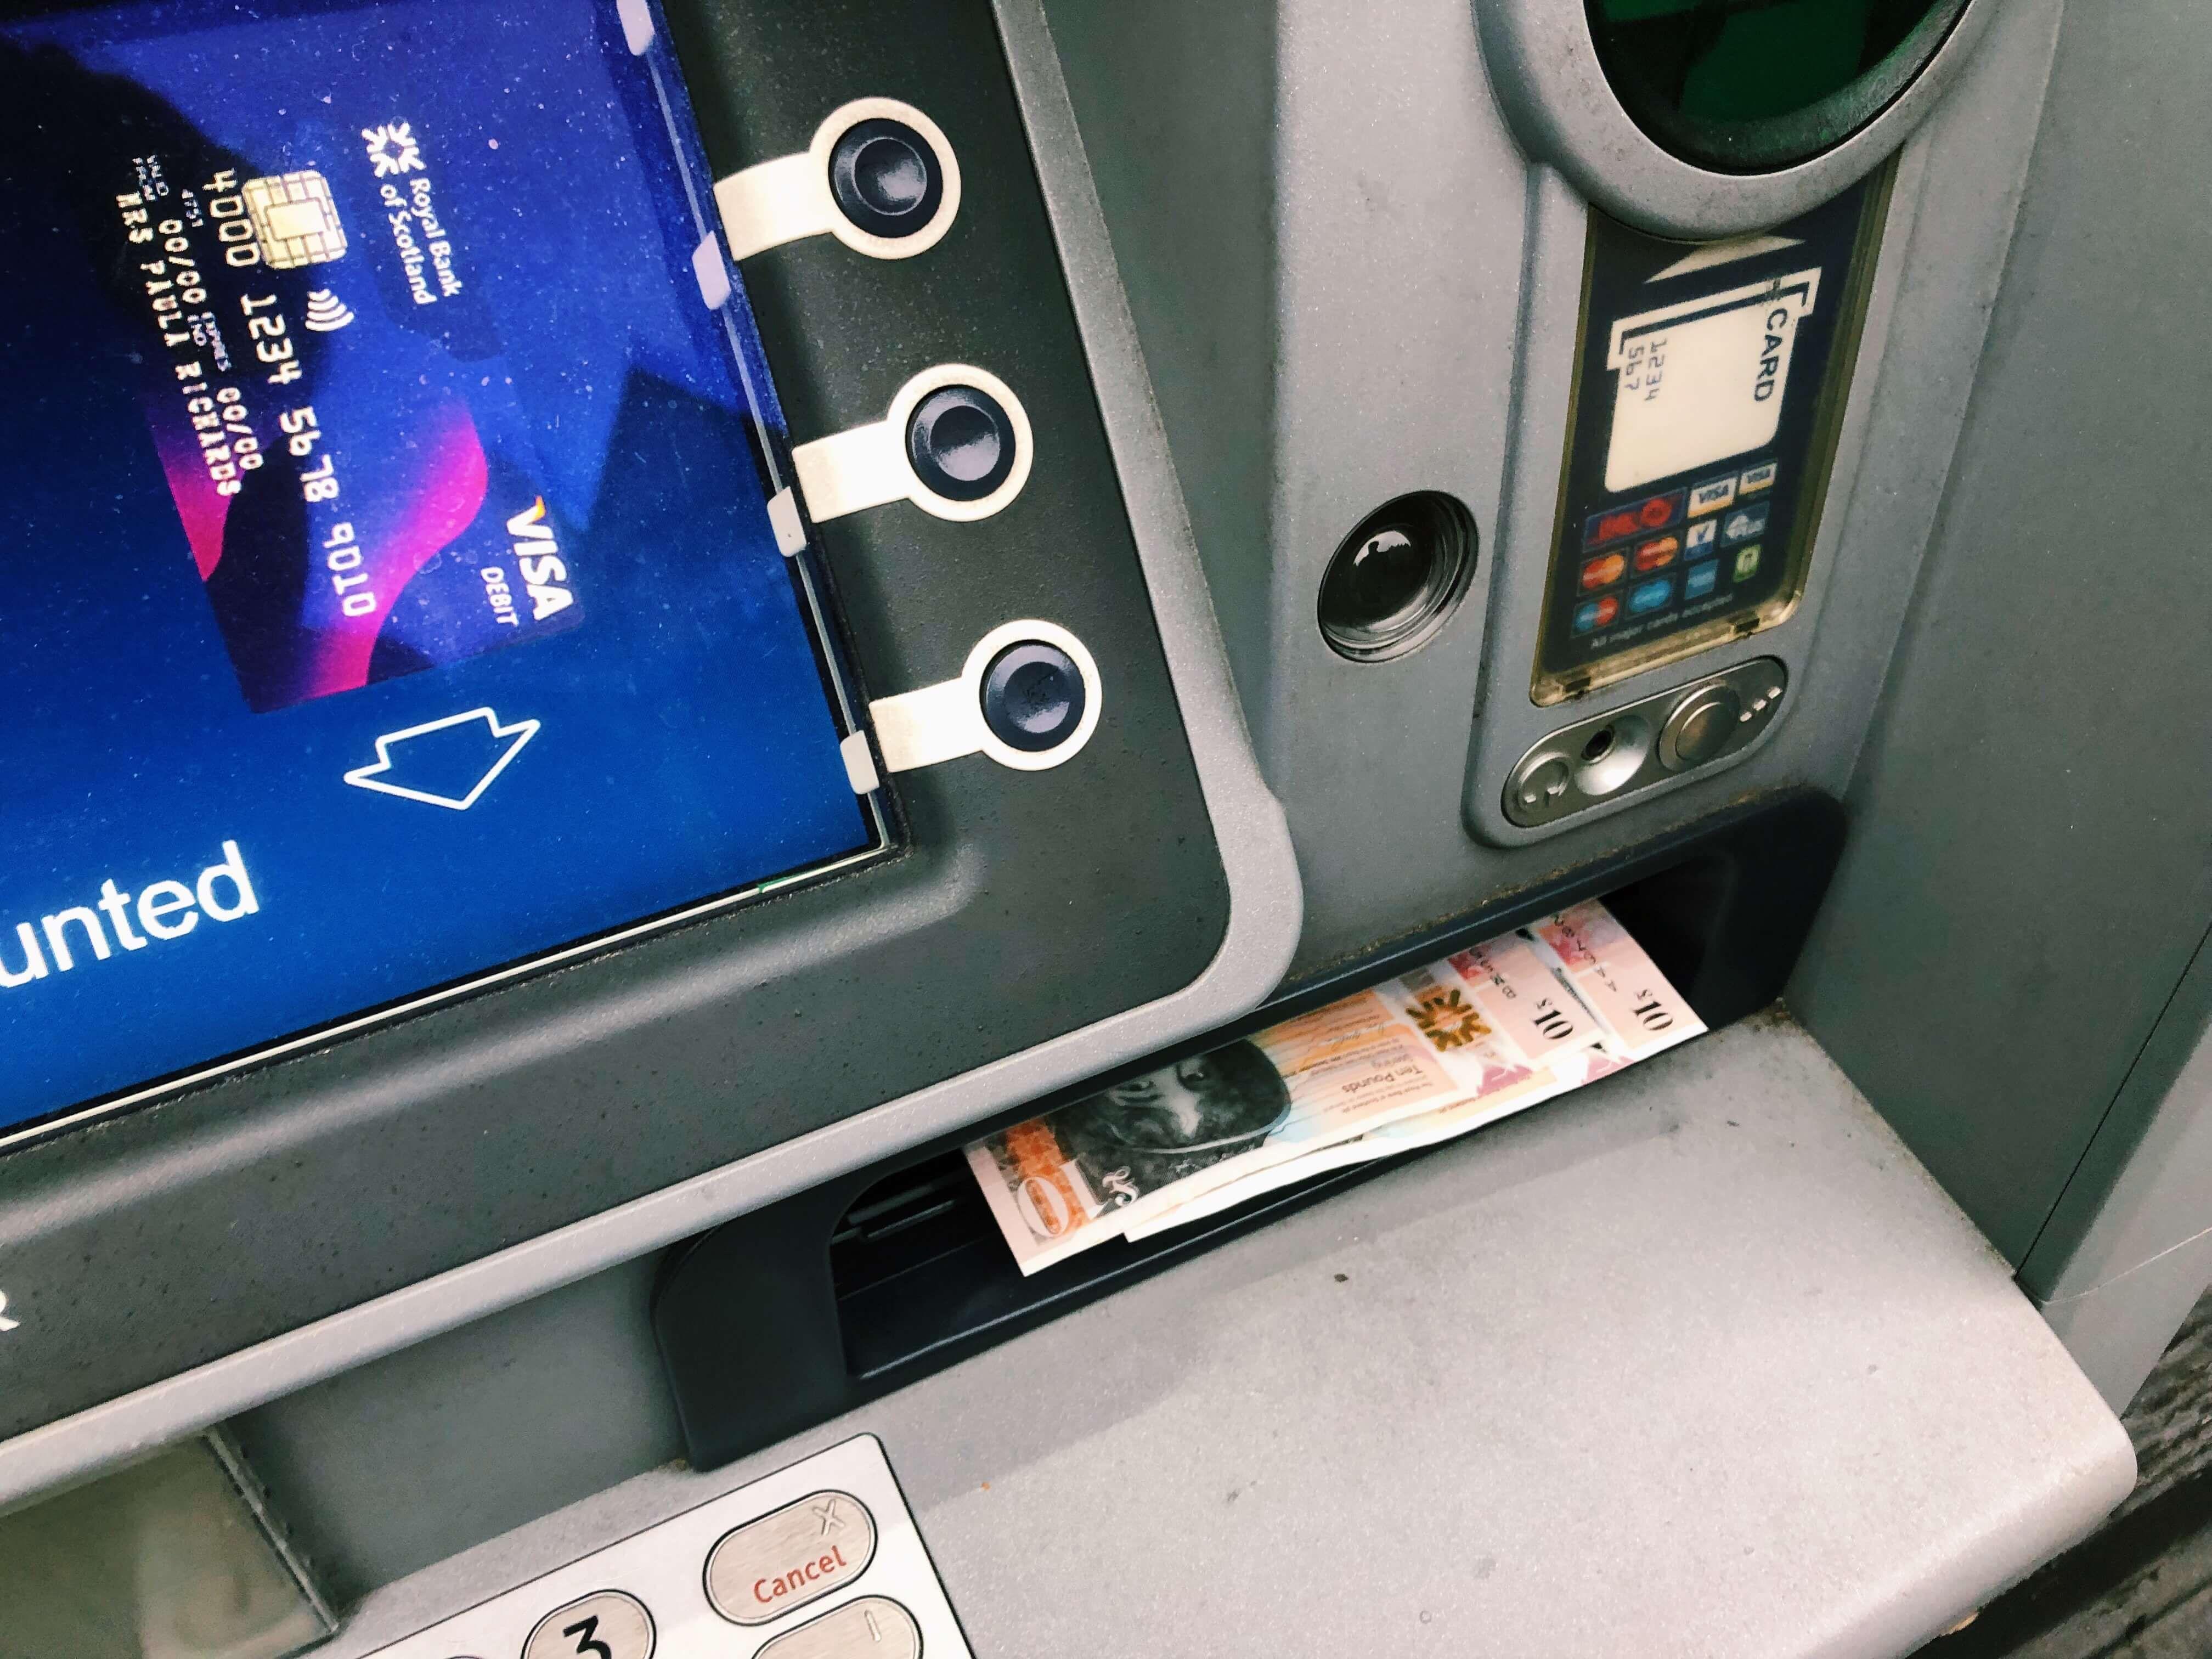 Image may contain: Spoke, Cash Machine, Atm, Machine